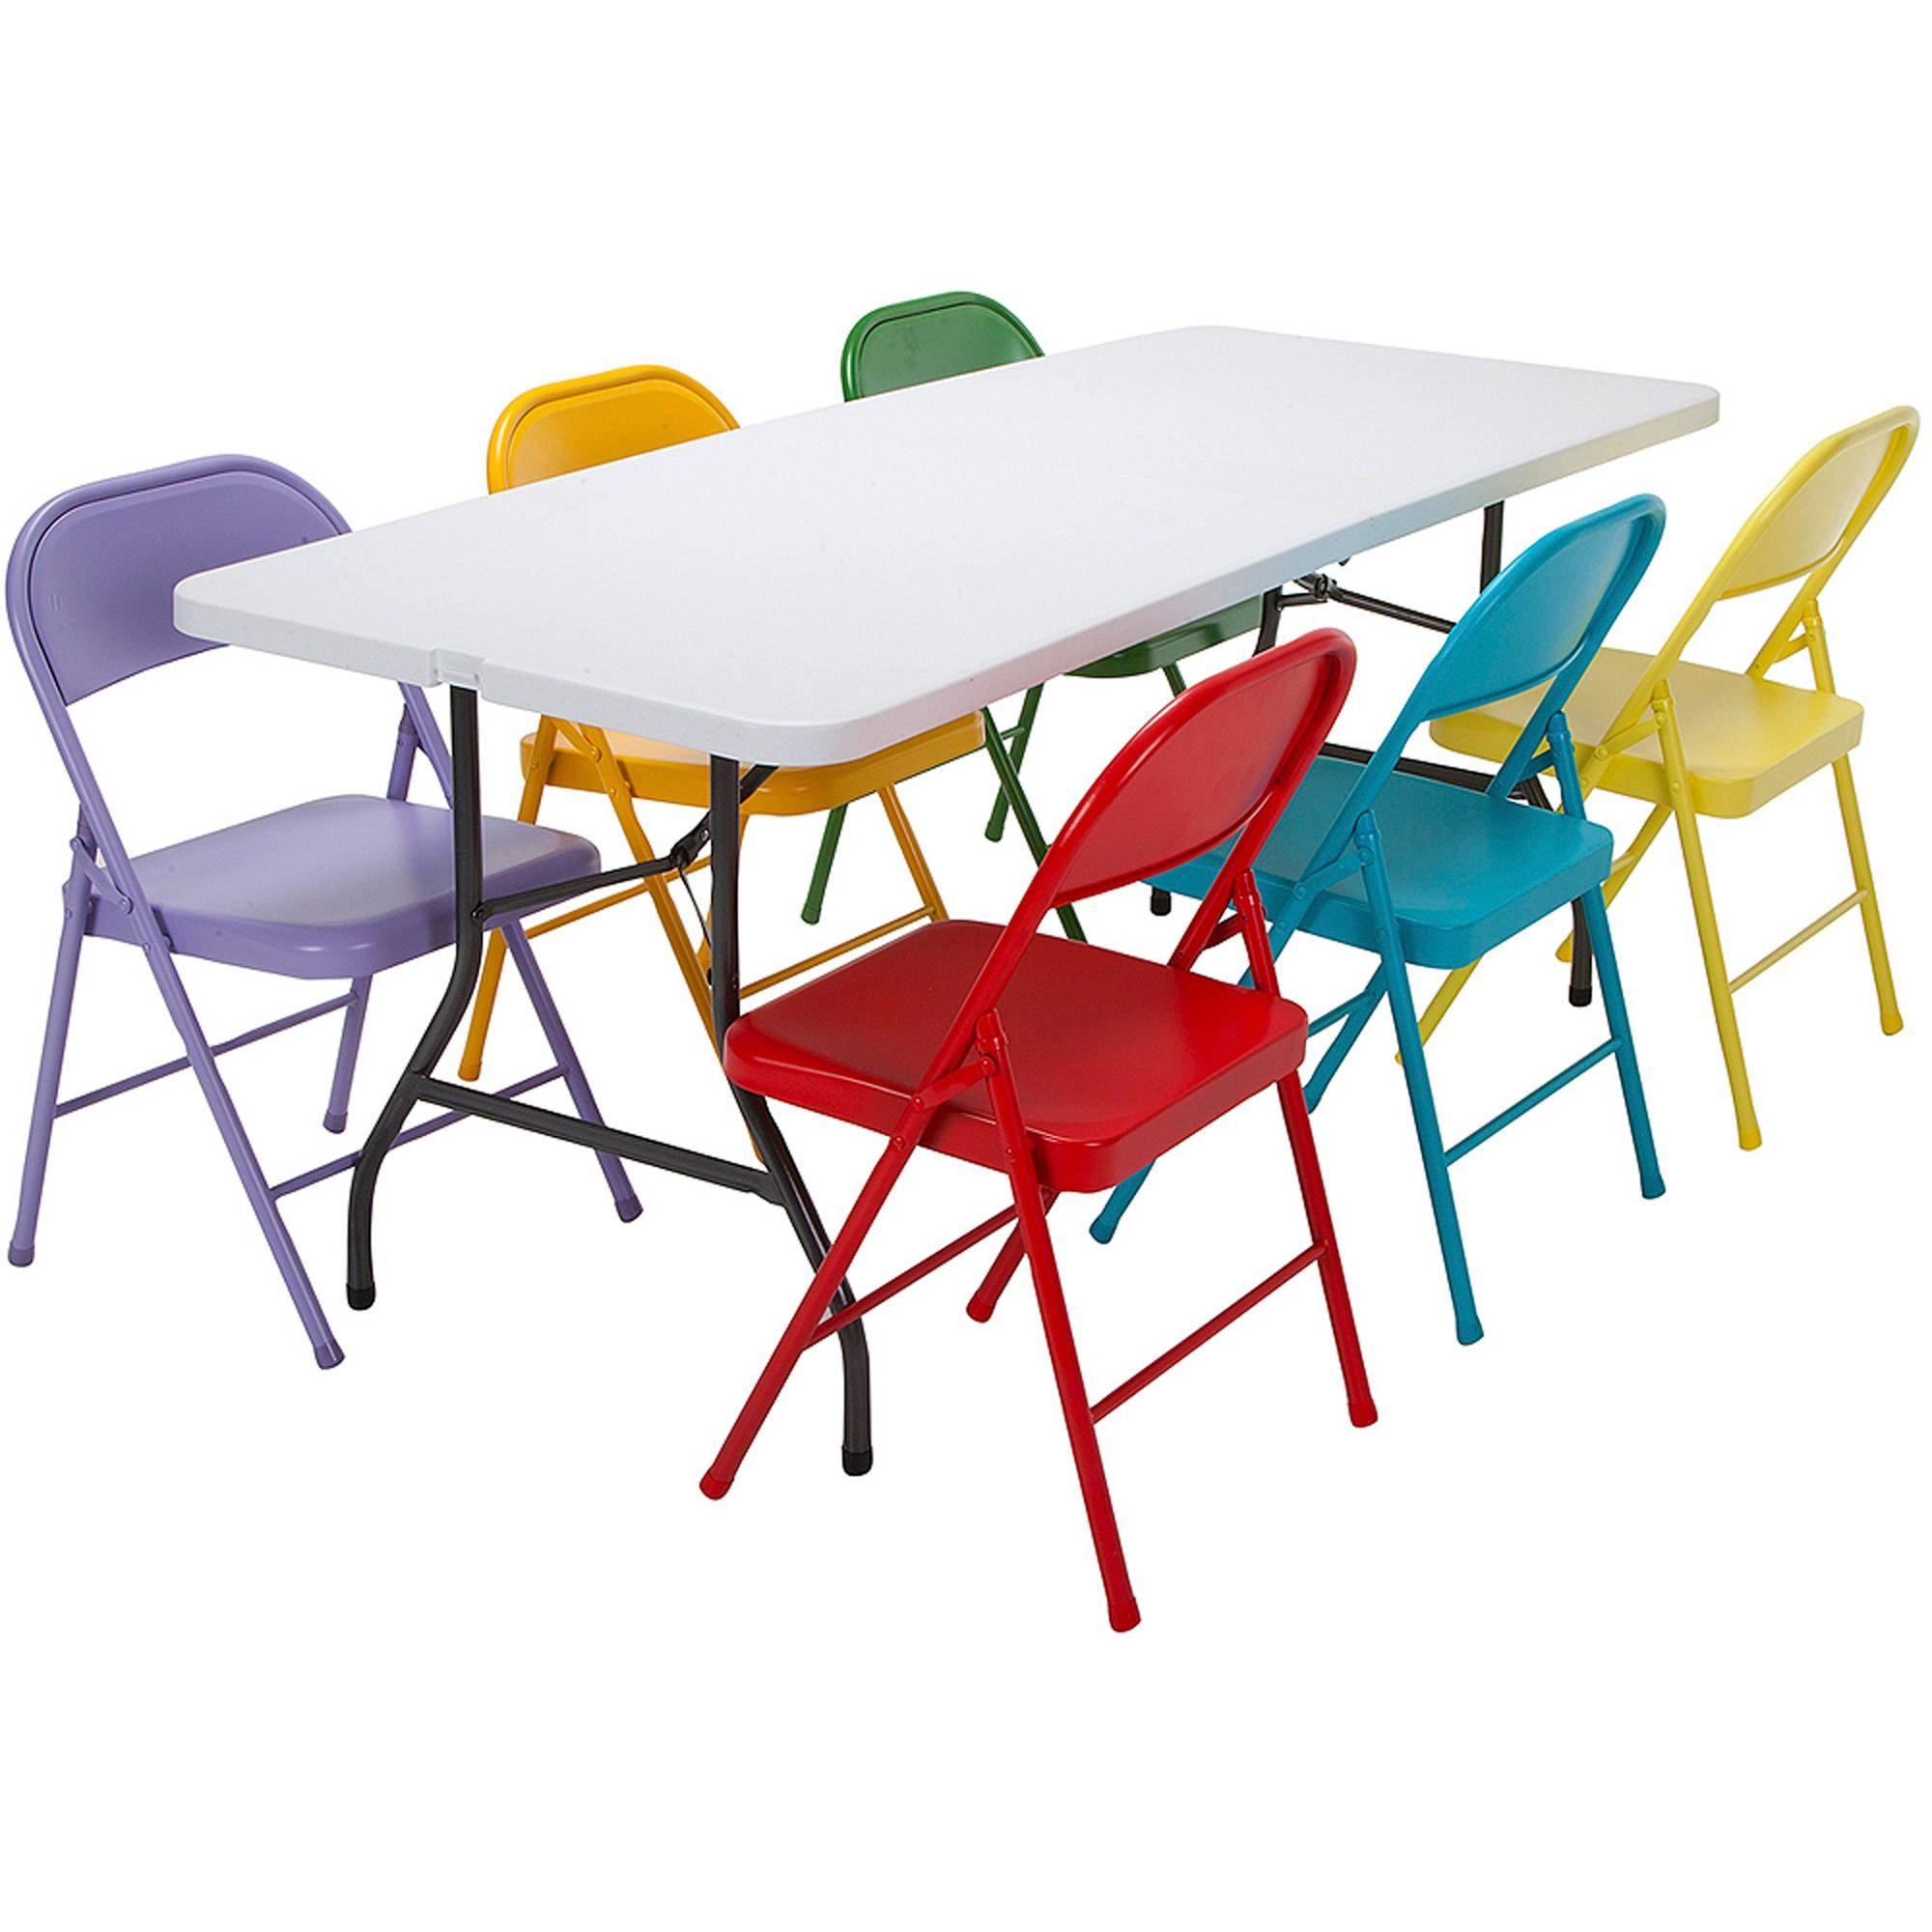 Home Folding chair, Chair, Steel